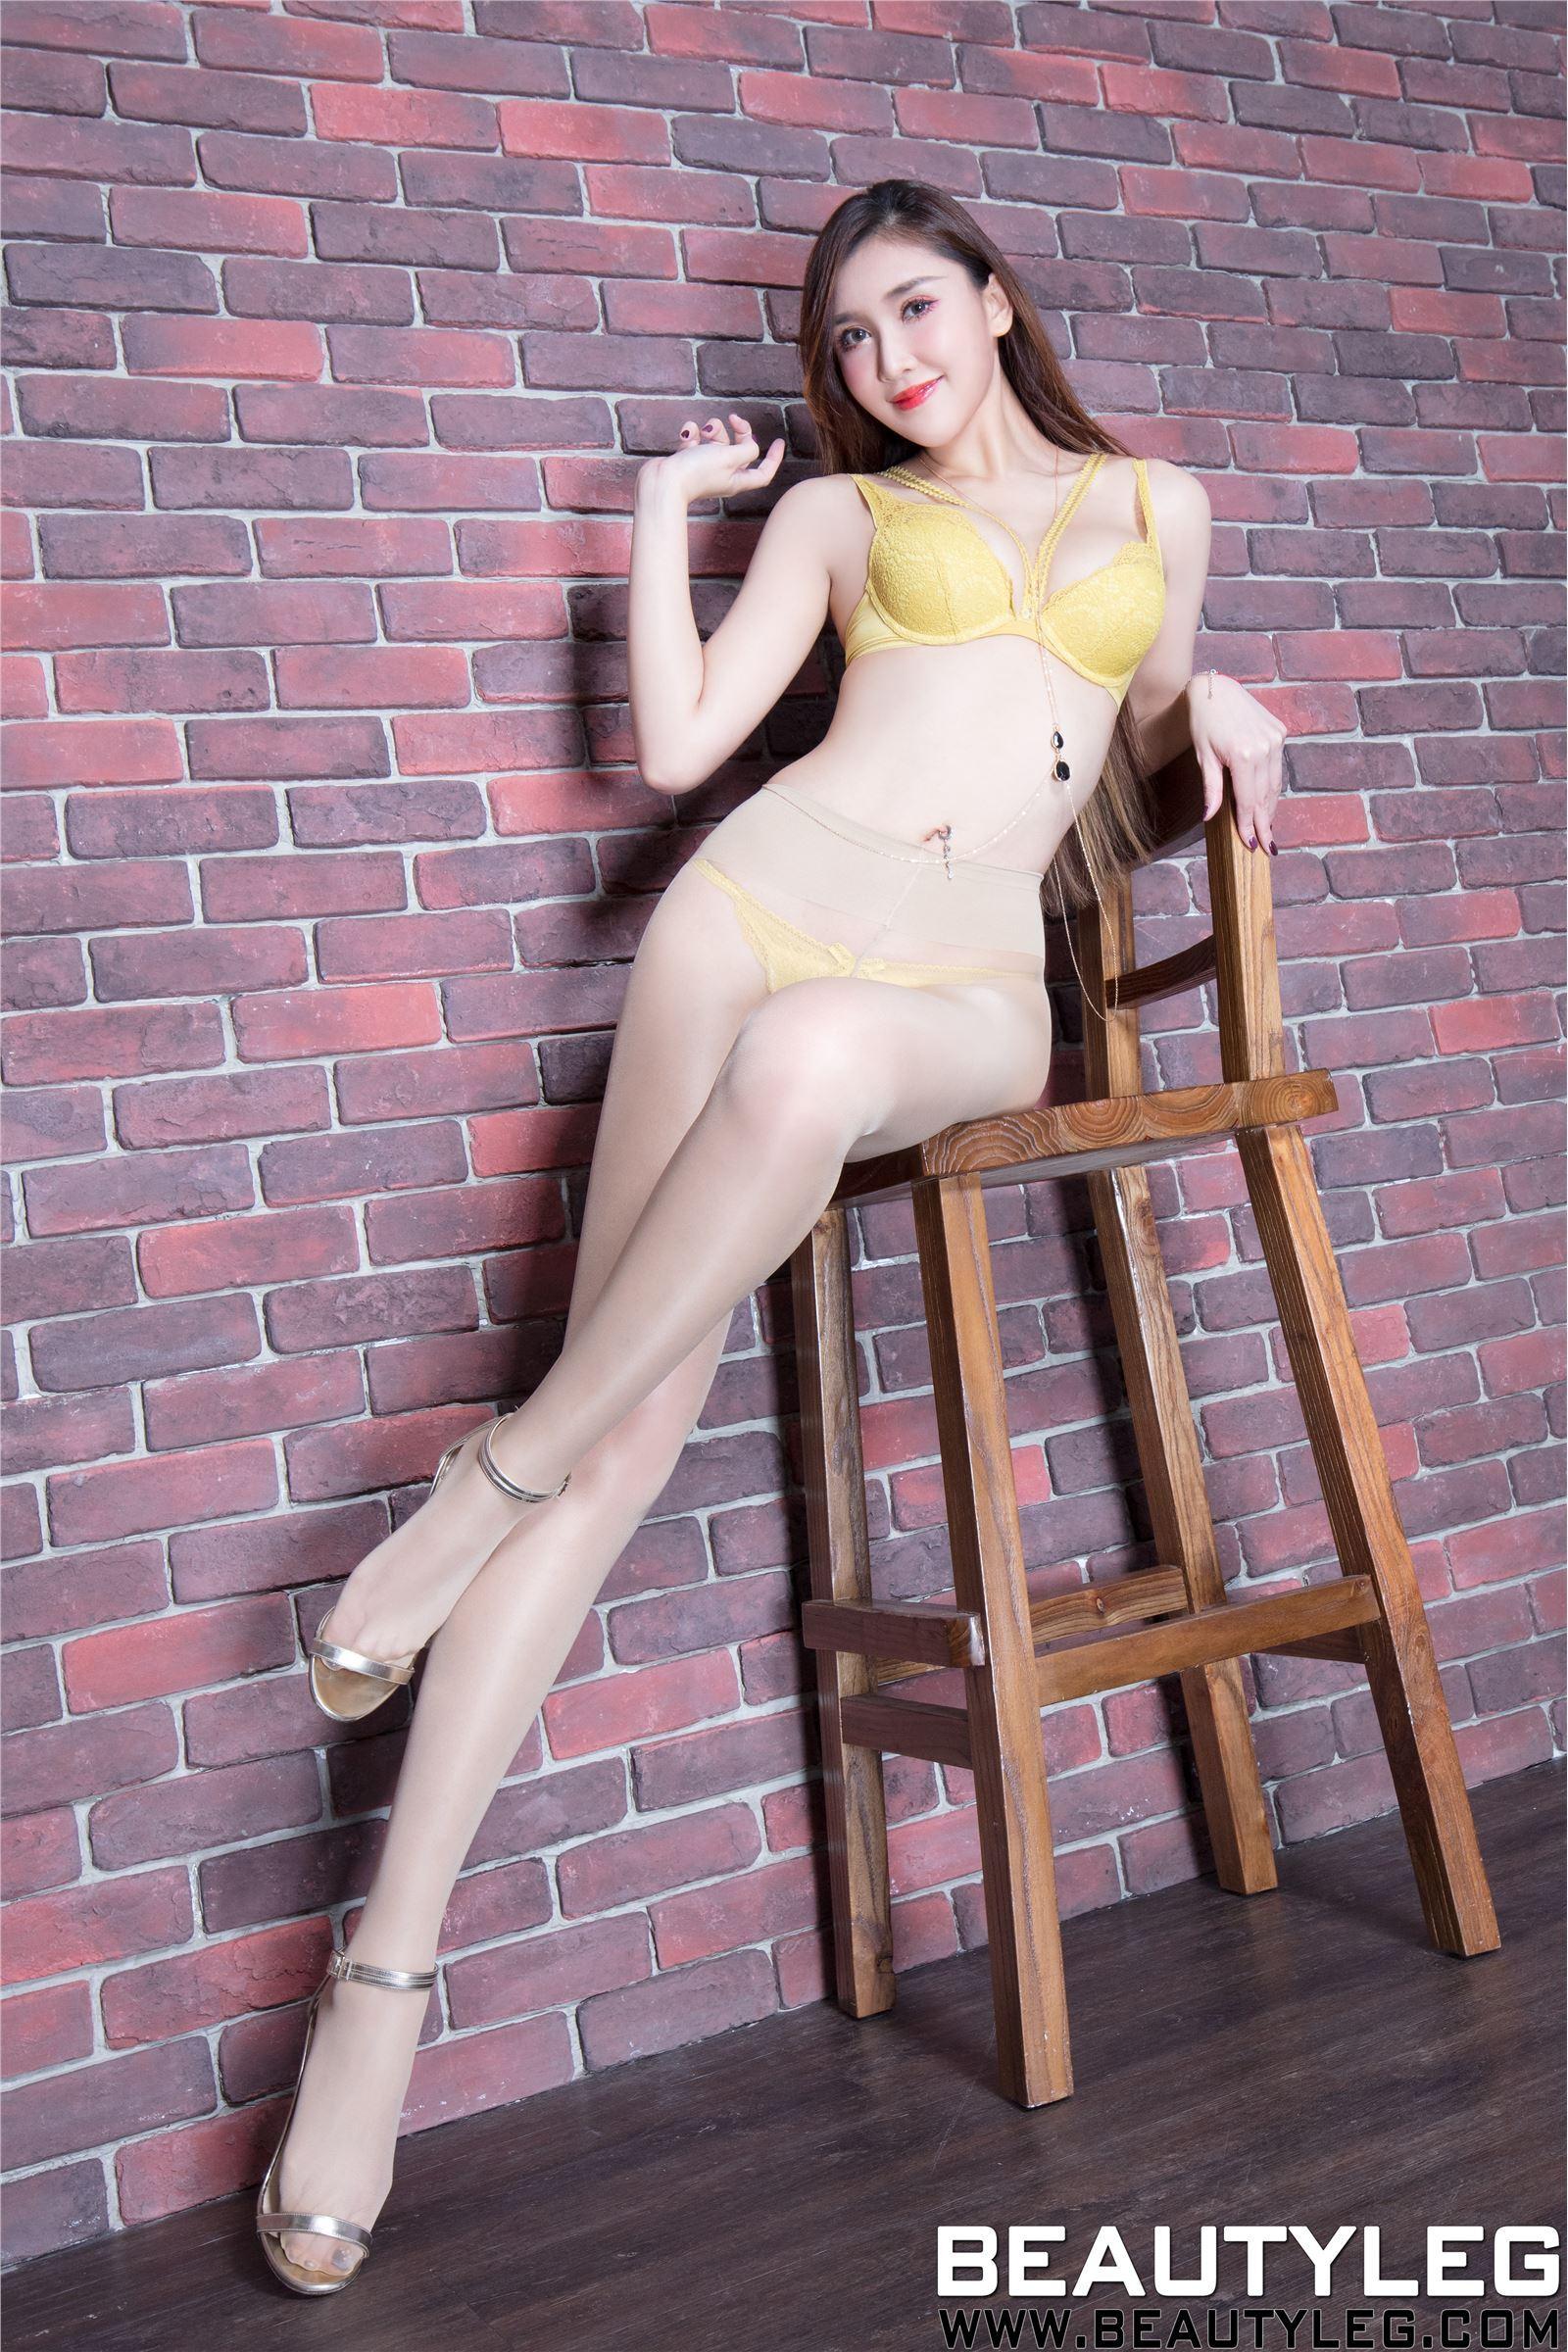 Beautyleg 2018.10.05 No.1667 Vanessa